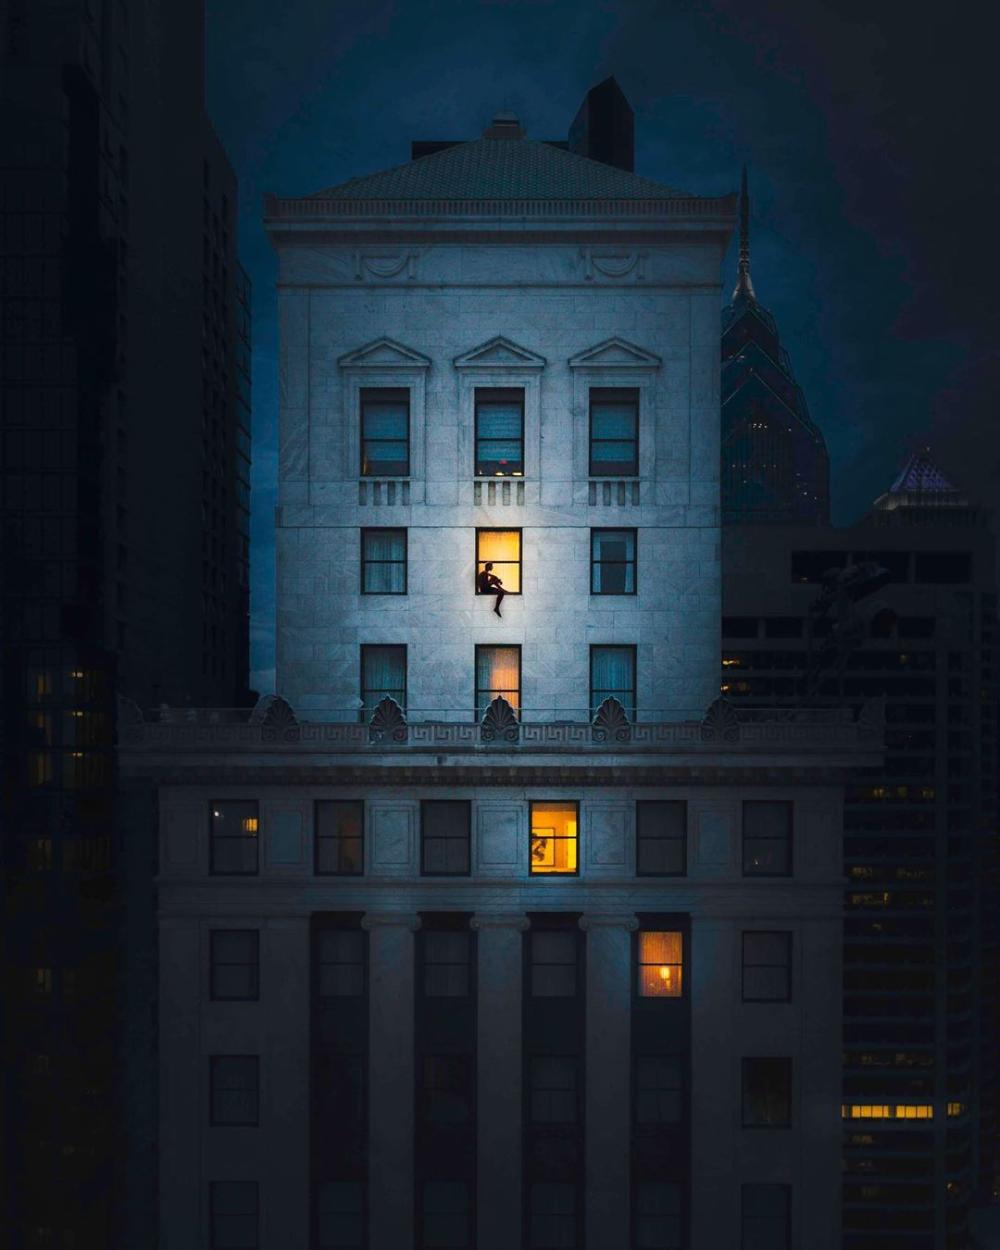 Awesome Philadelphia Photographs by Chris Hytha